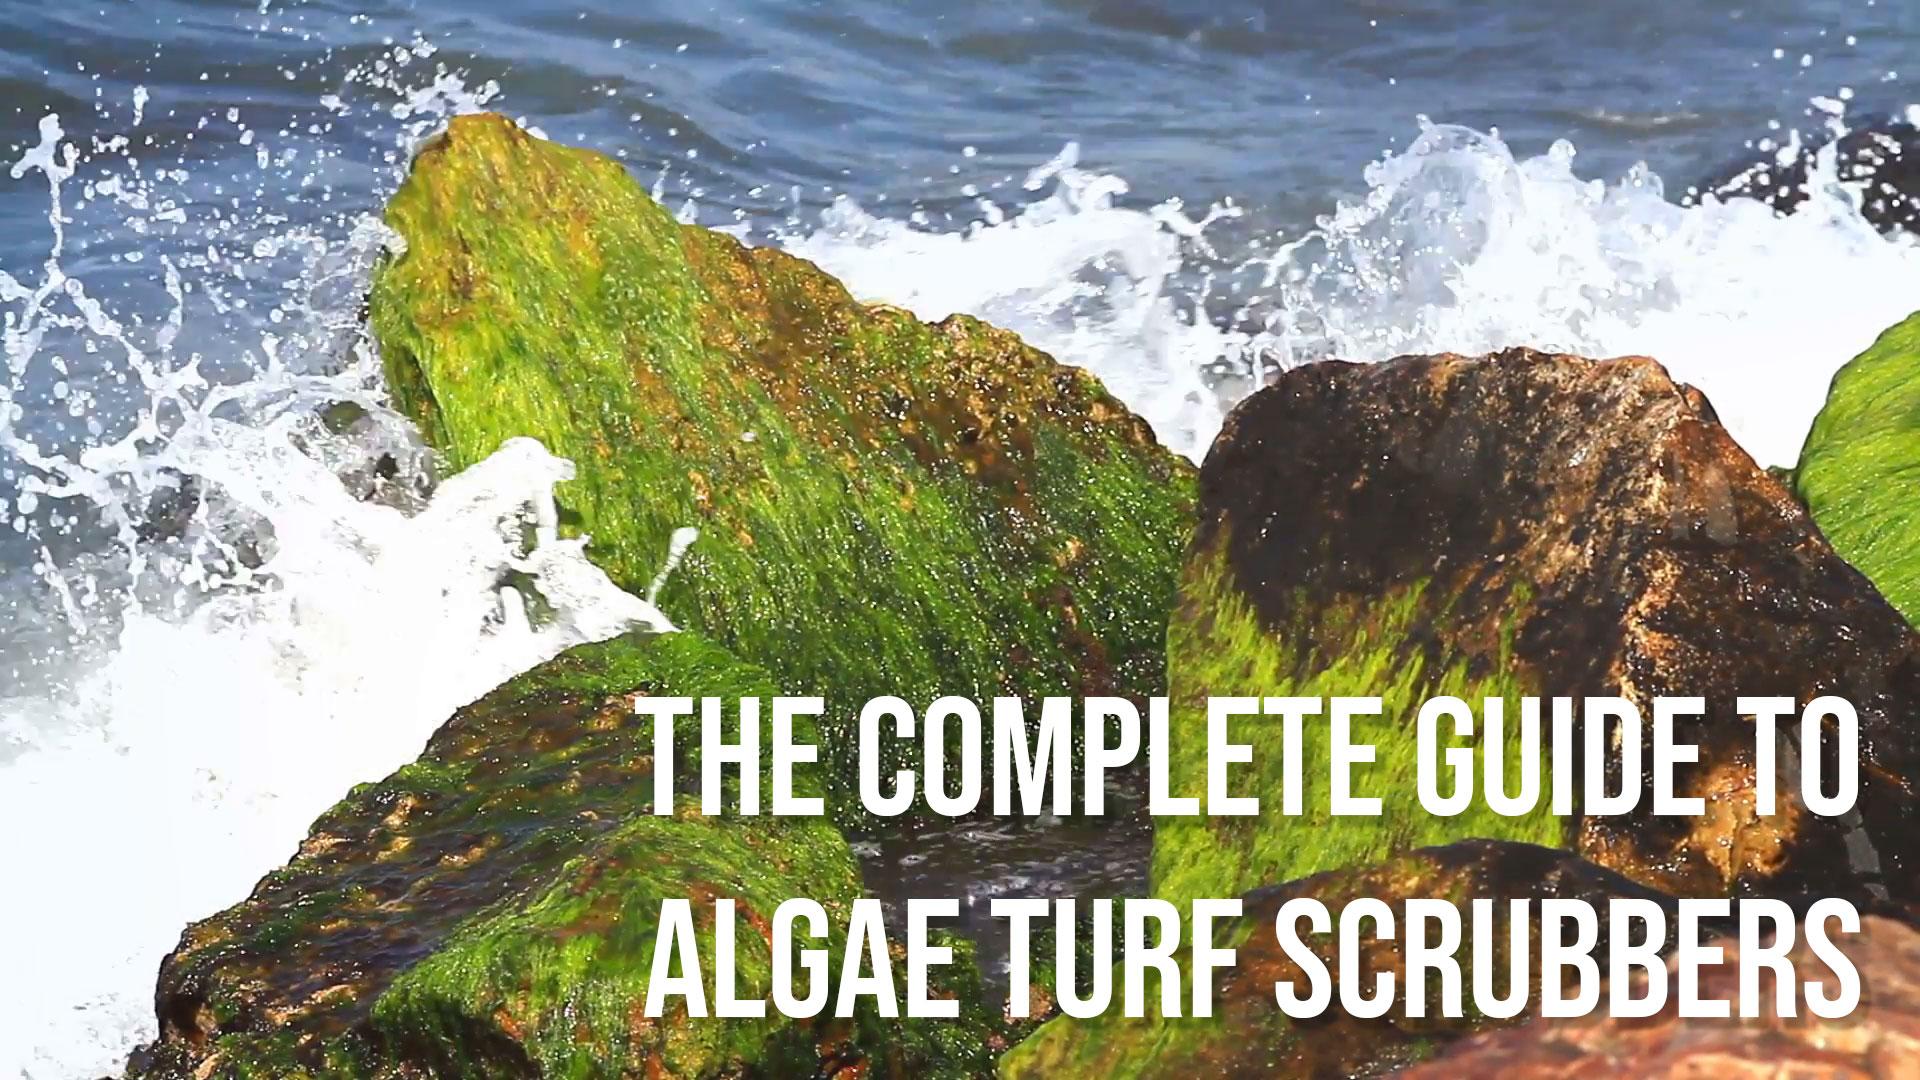 ocean-water-with-algae-and-rocks